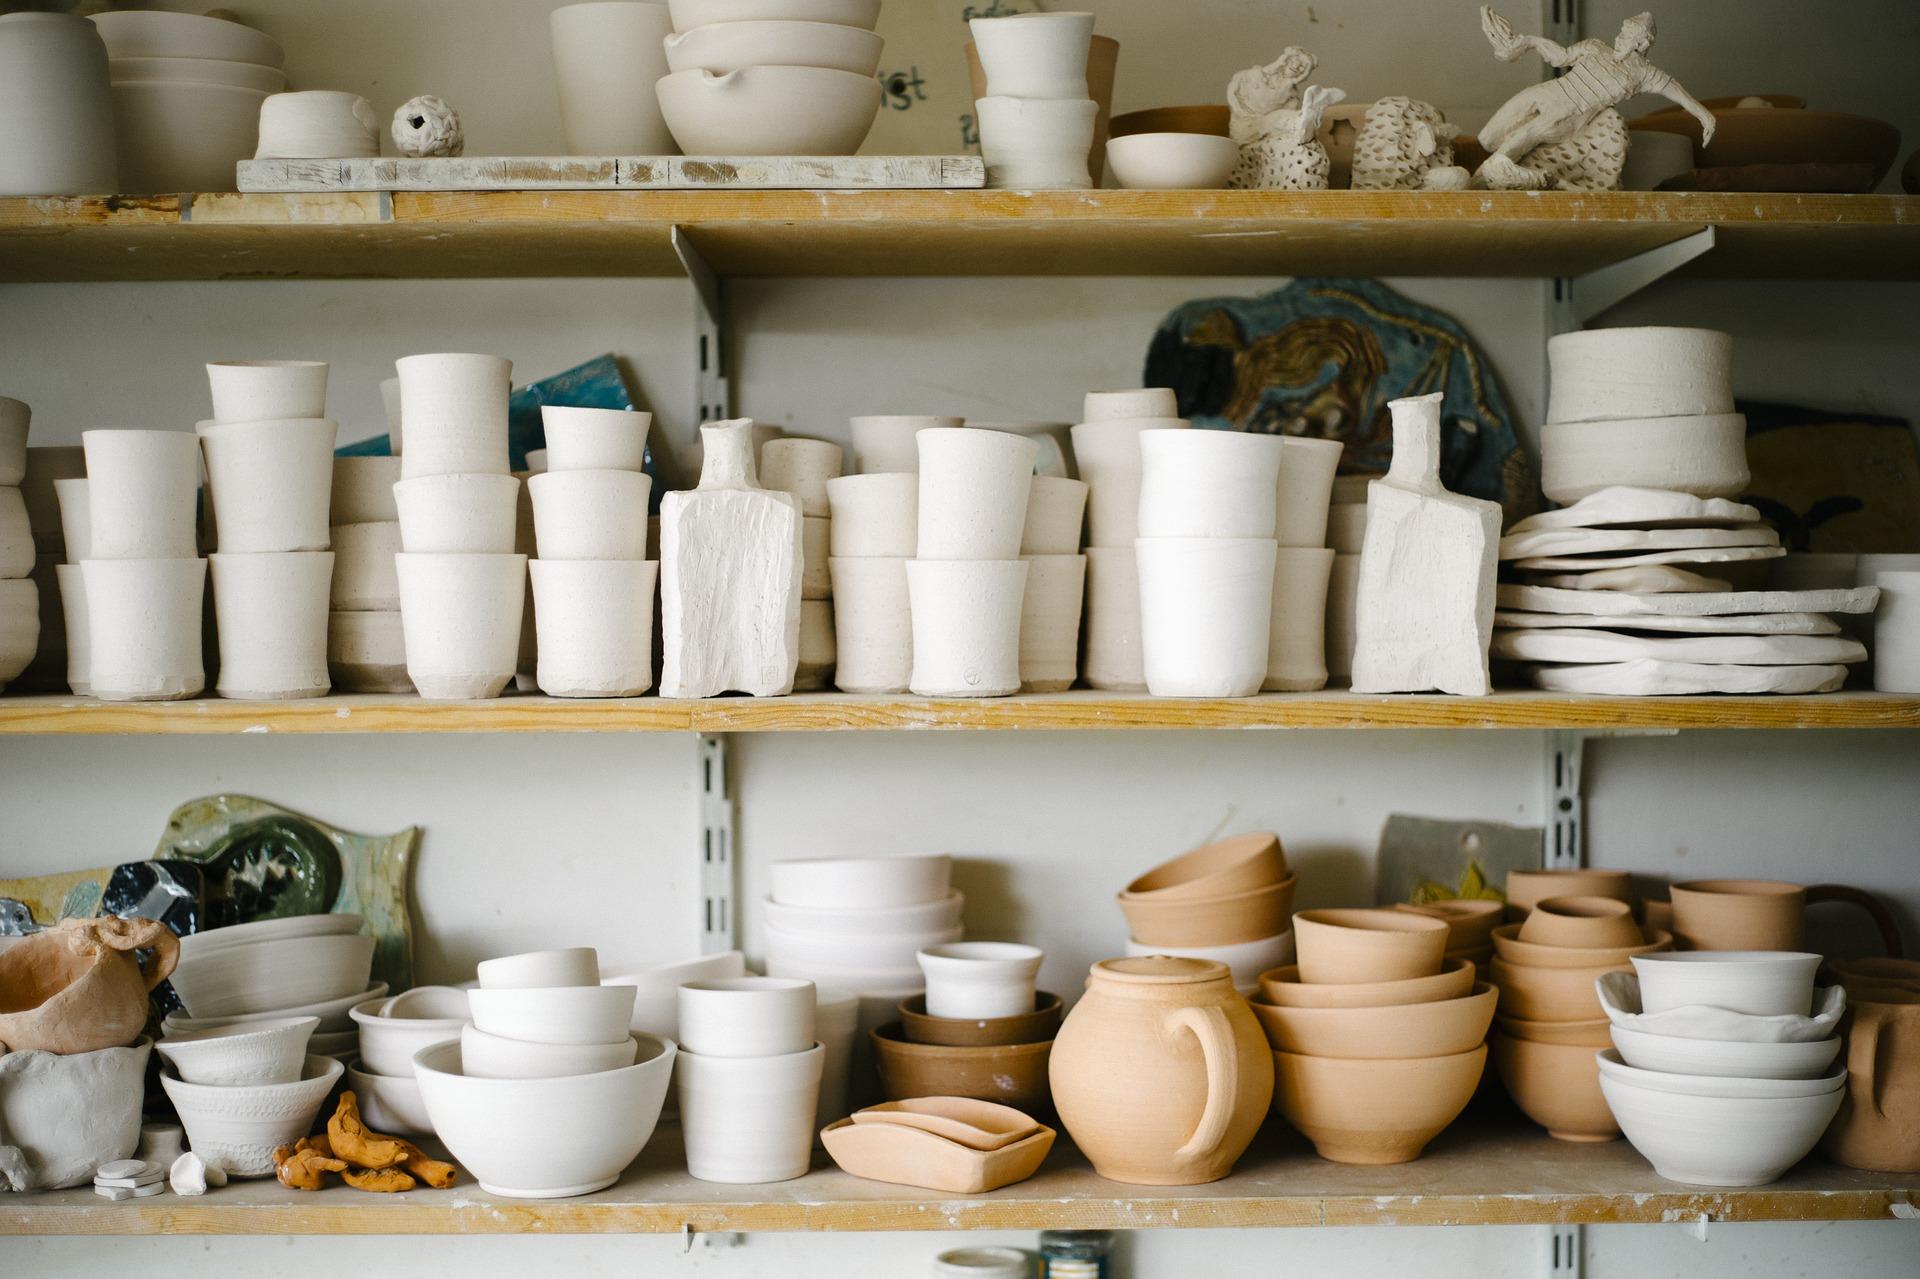 pottery-pixabay-art-701749_1920.jpg